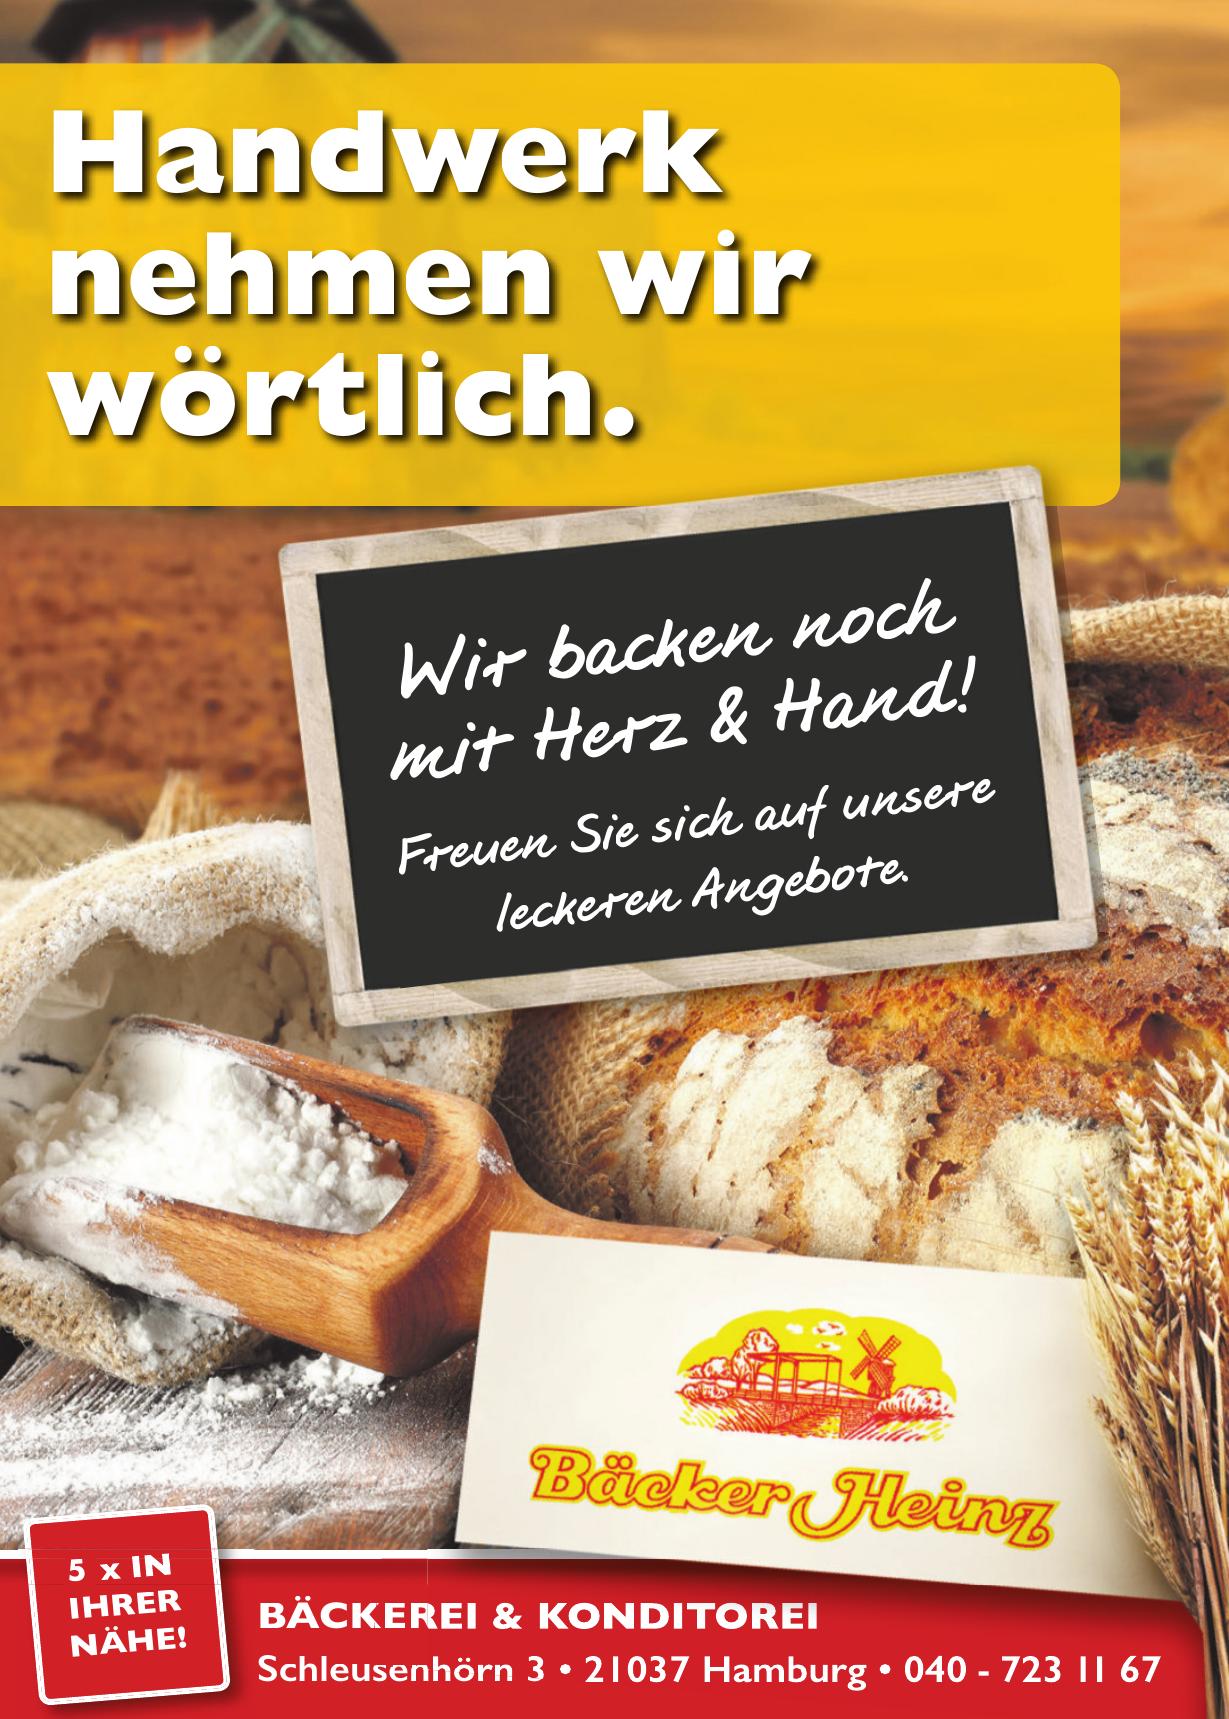 Bäcker Heinz Bäckerei & Konditorei